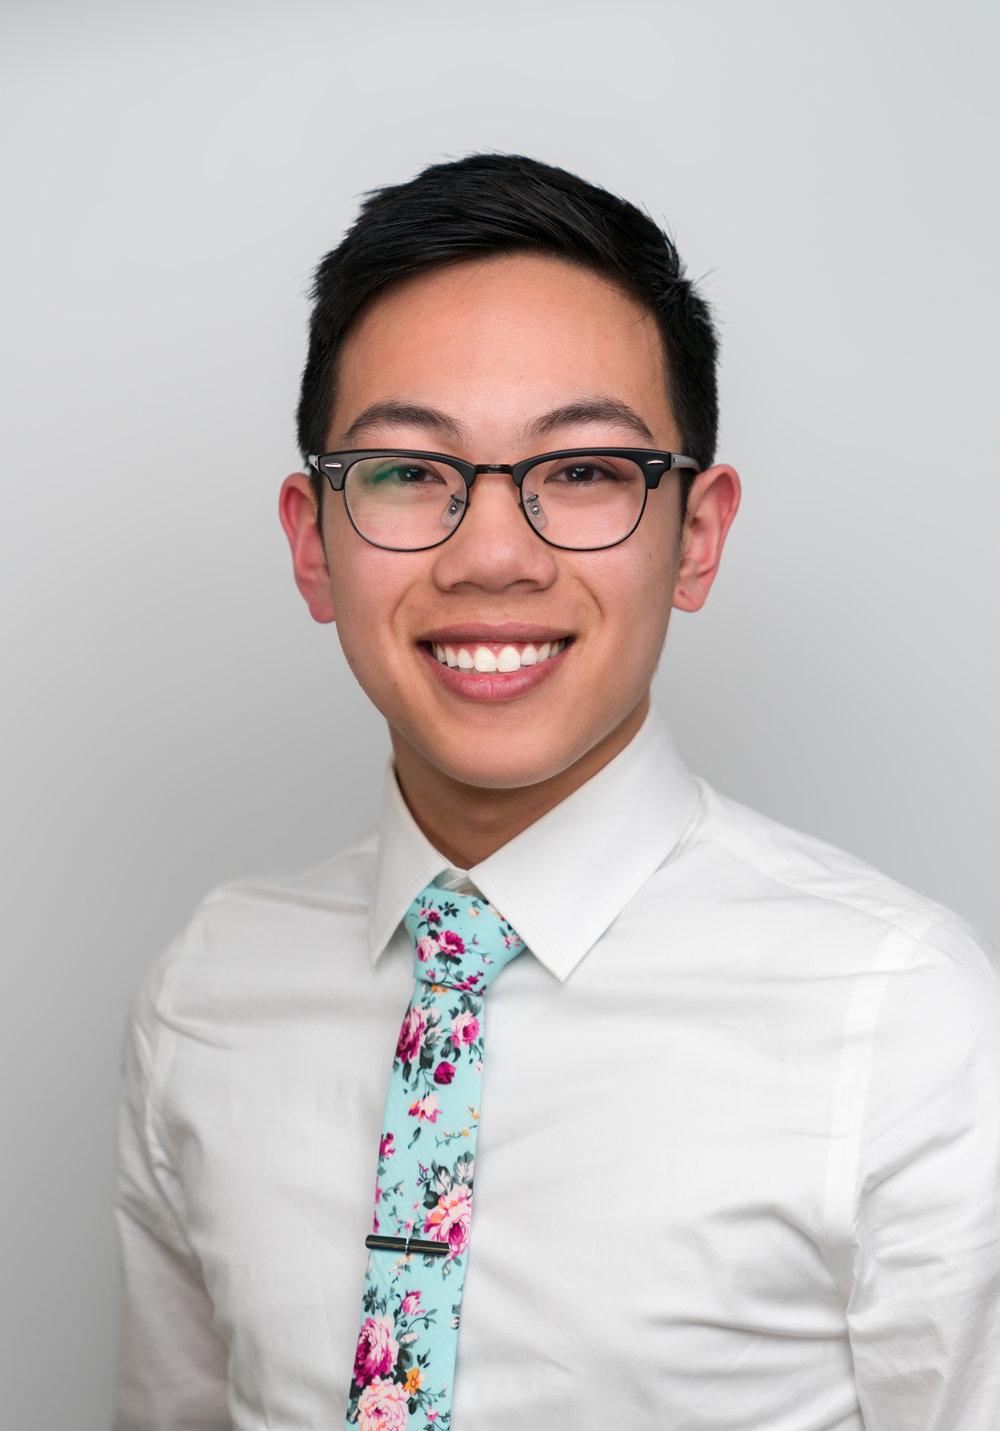 Daniel Vu   Major: Neurobiology, Physiology, and Behavior Career Goal: Gastroenterologist/ GI Surgeon